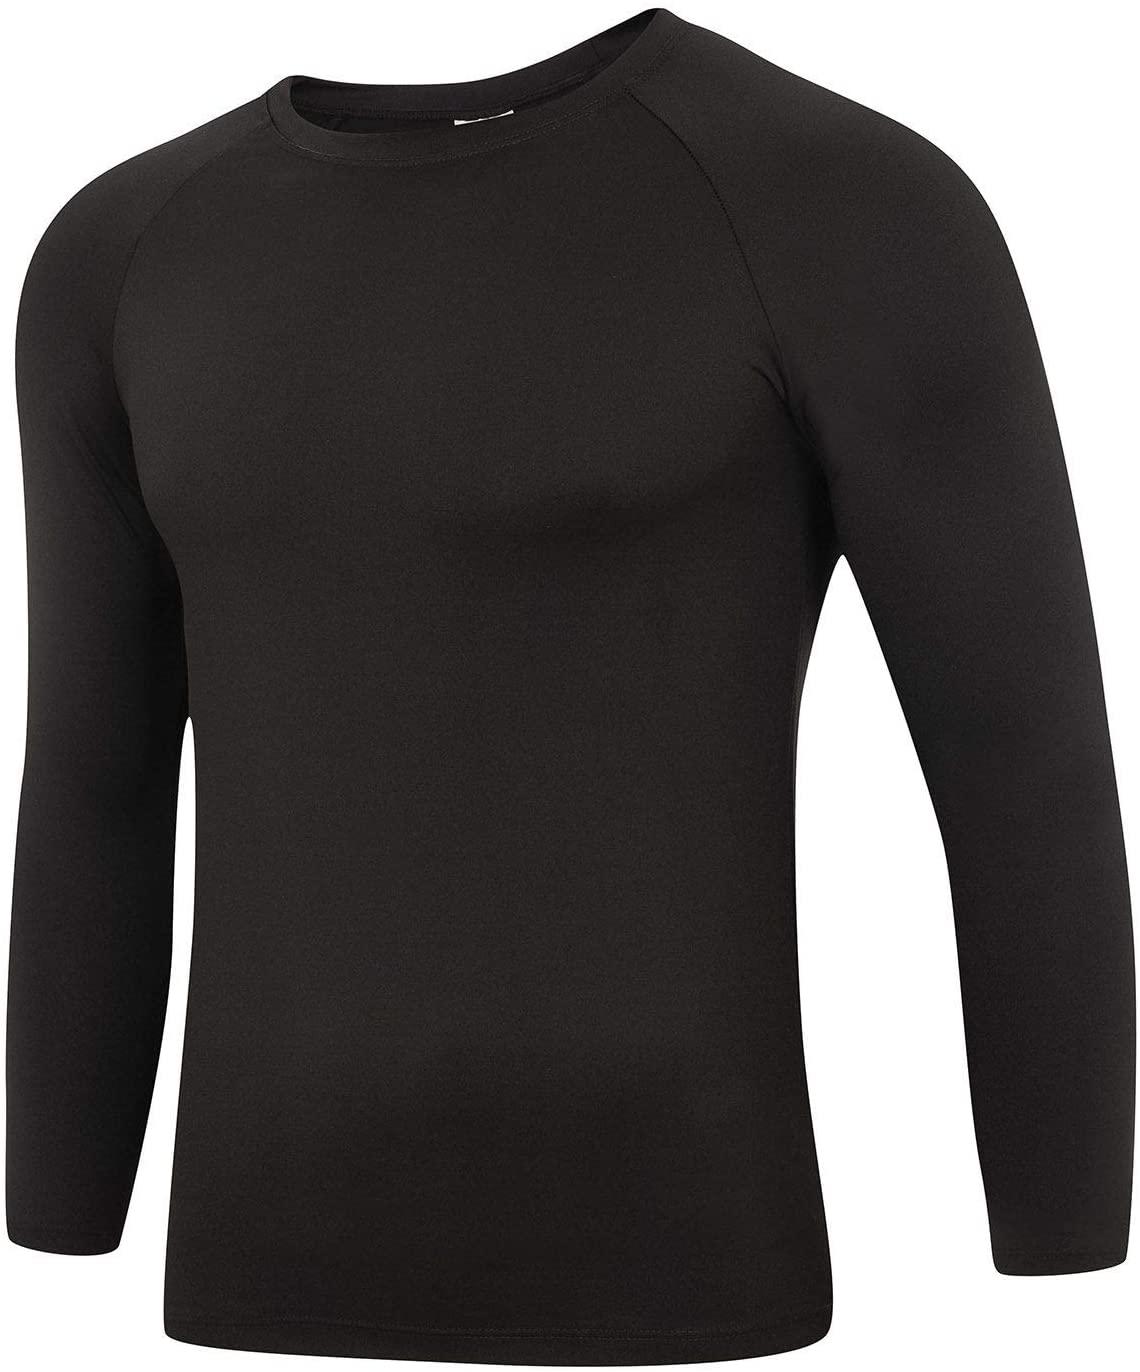 Kit Calça + Camisa Segunda Pele HSS Cool